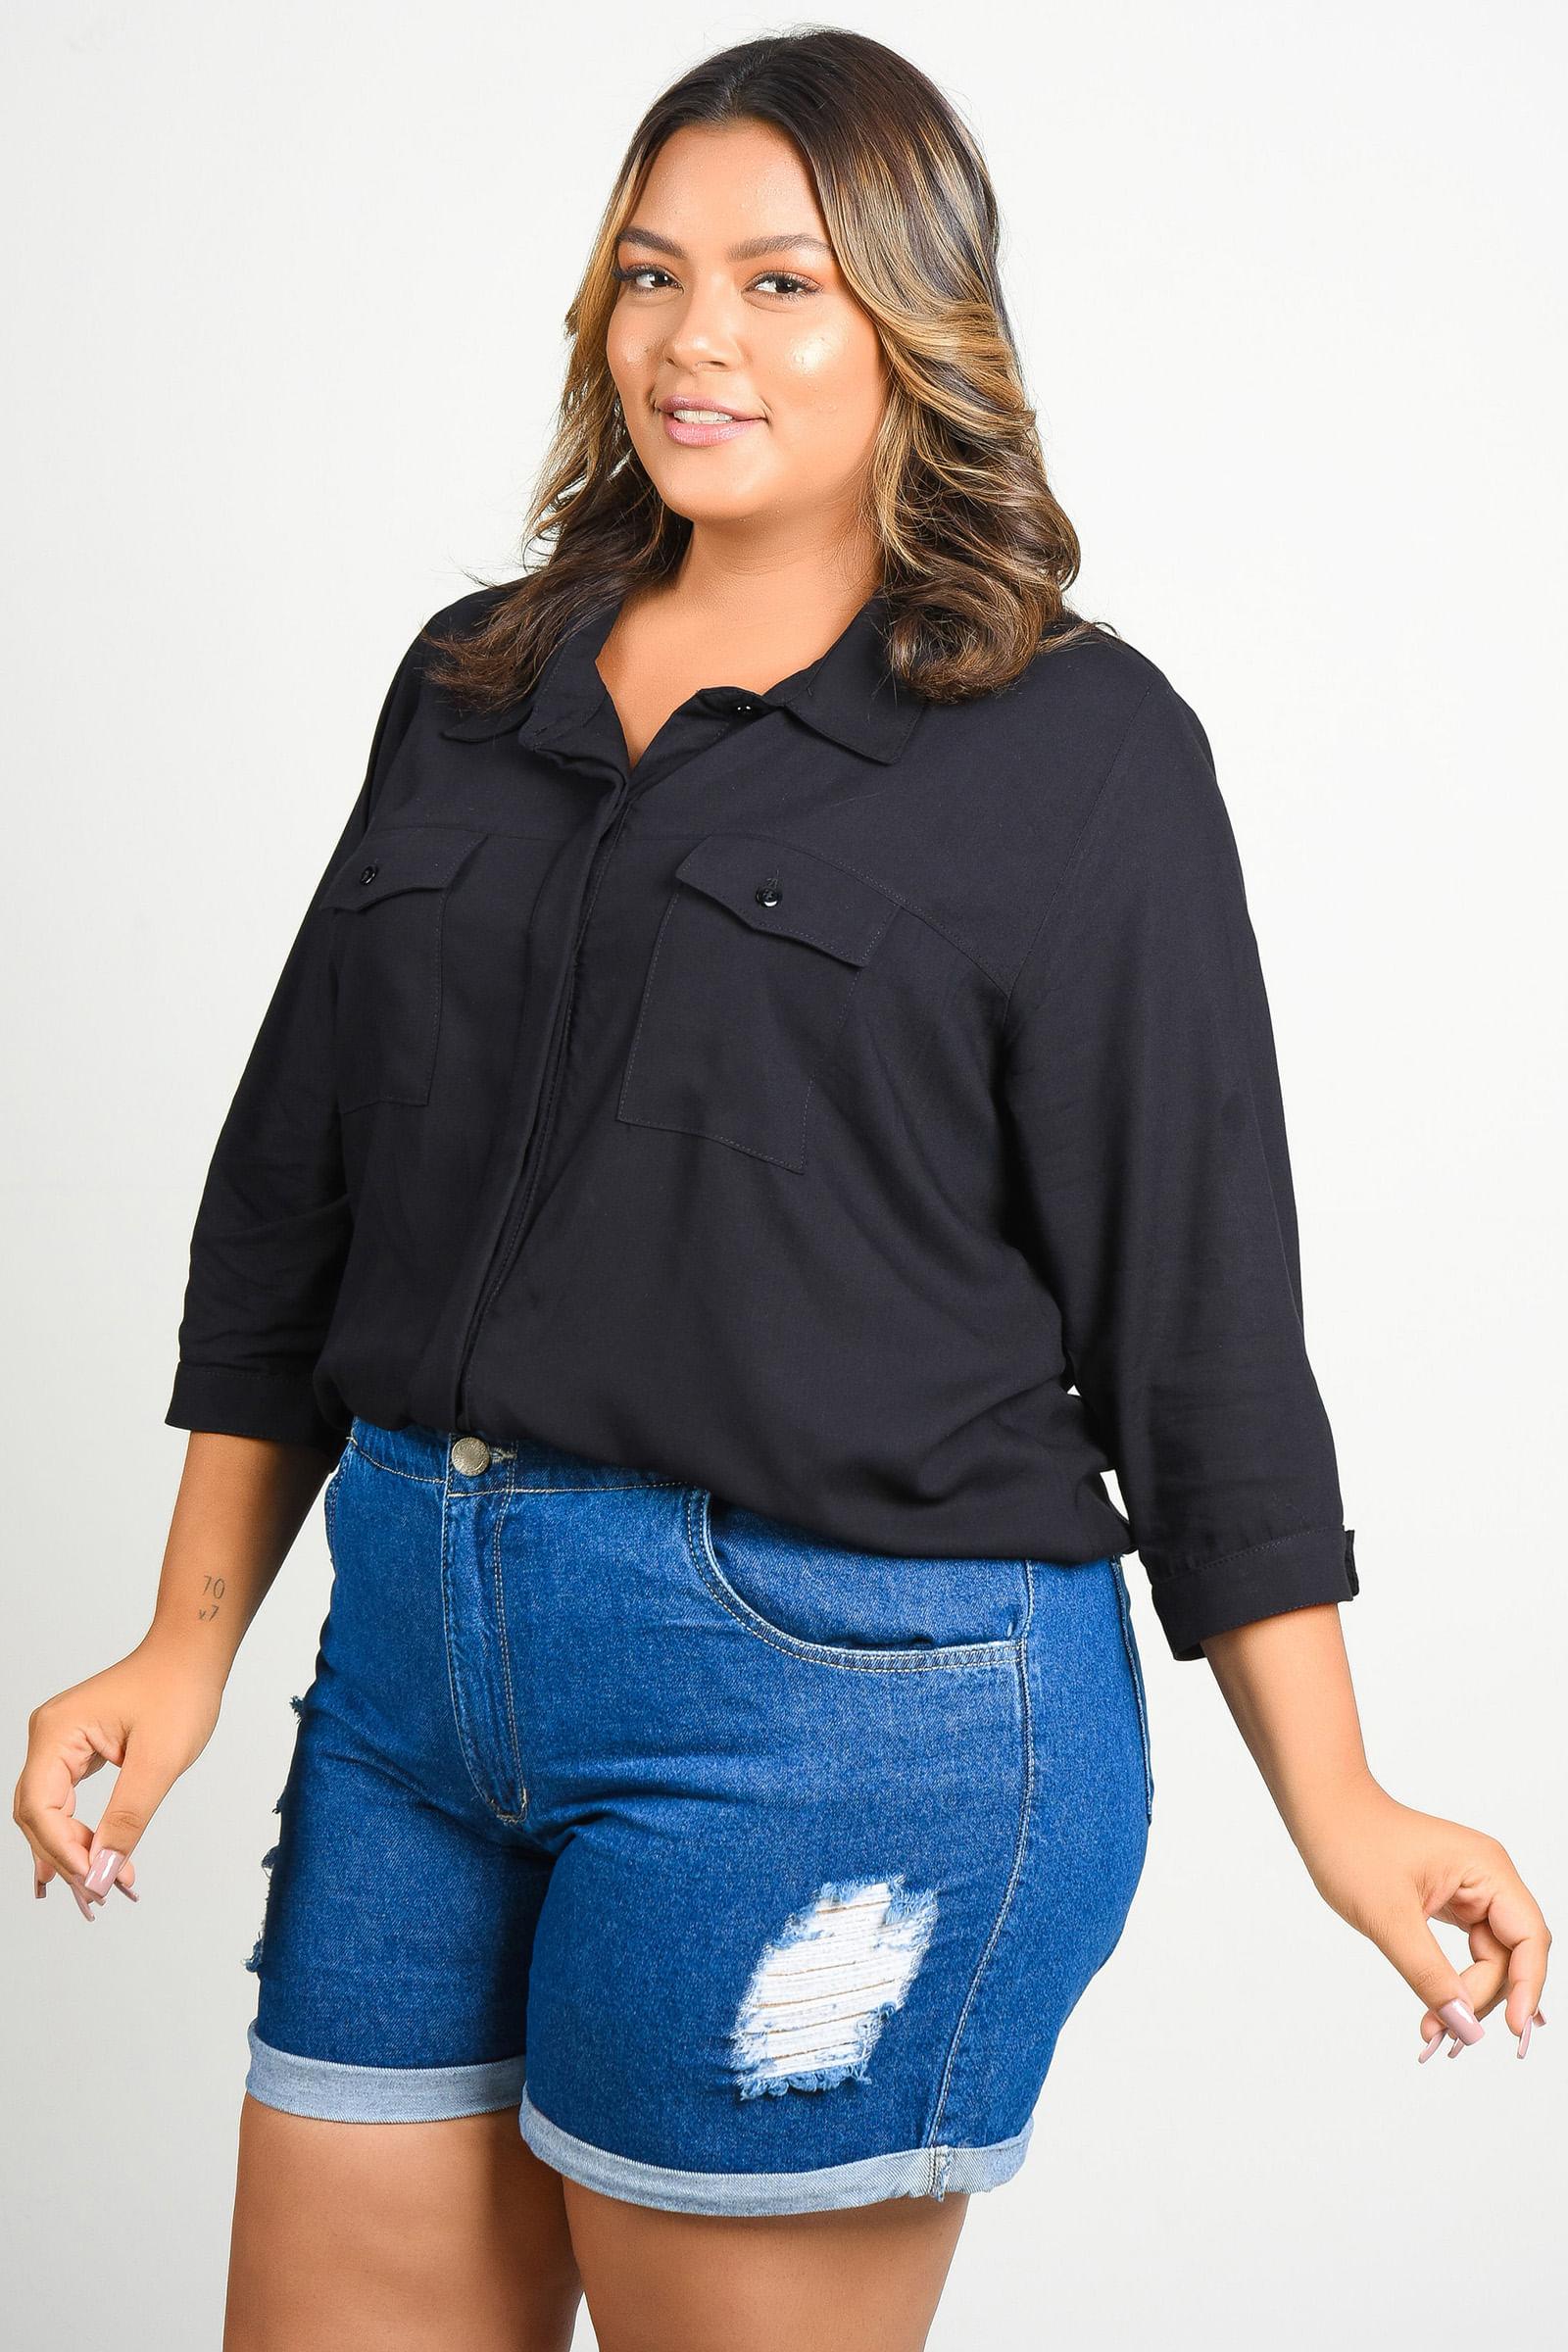 Camisa de viscose plus size preto